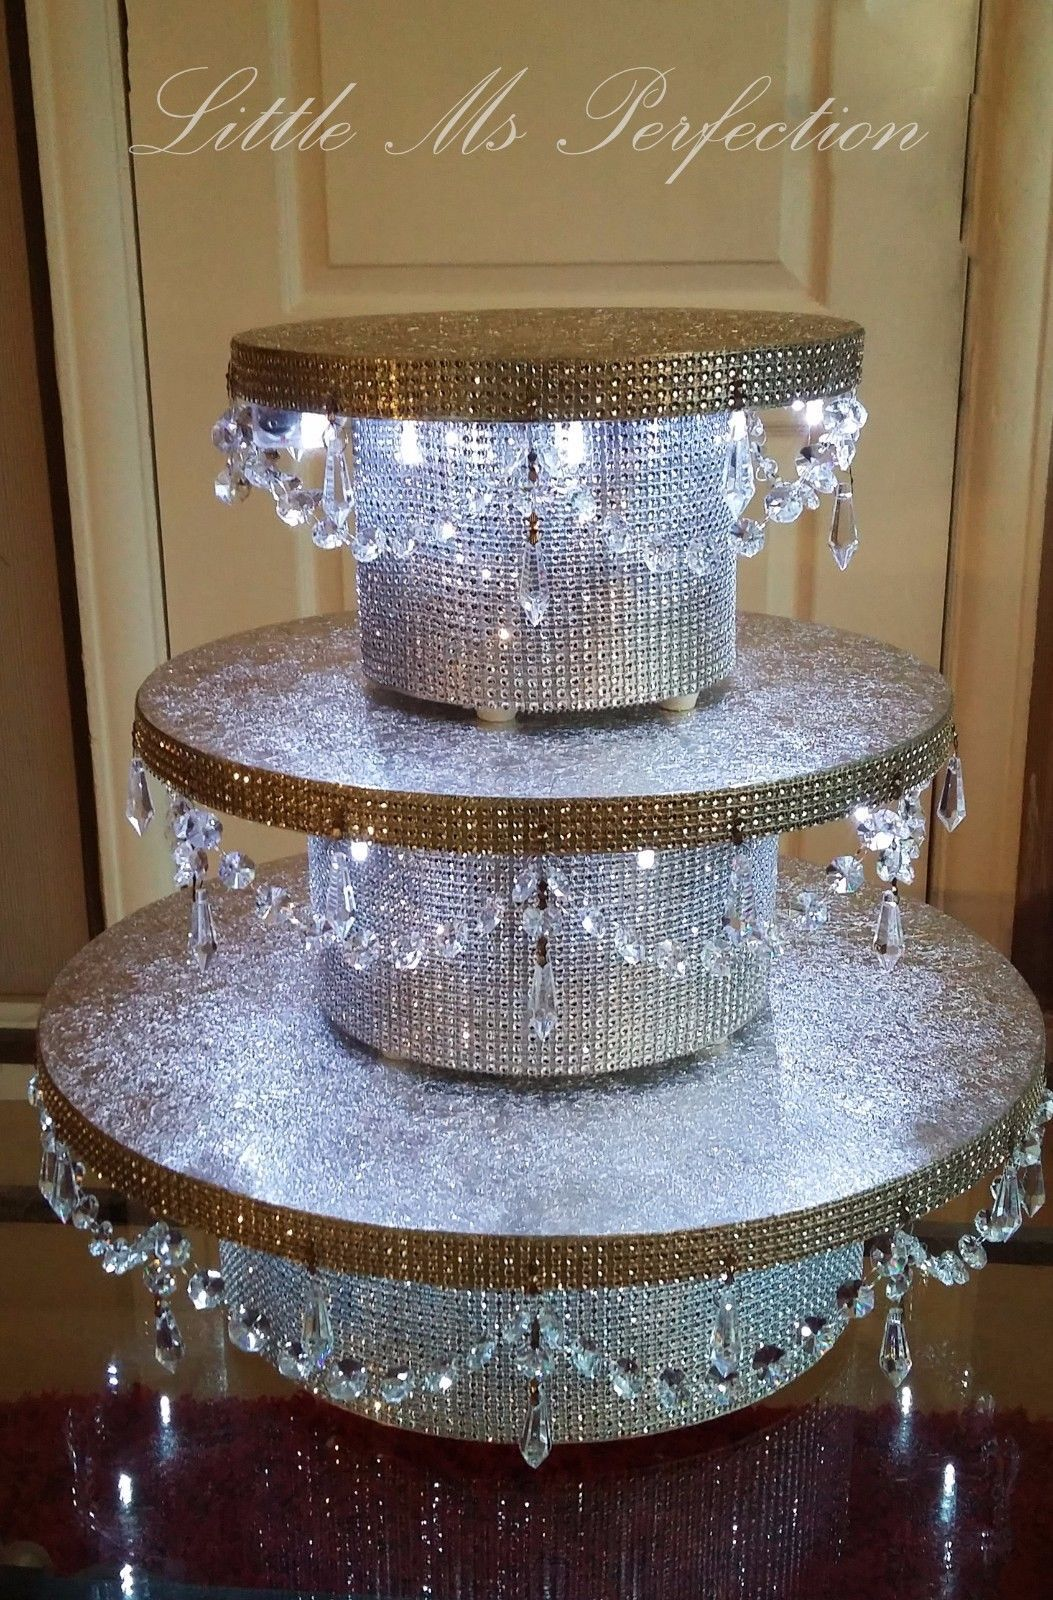 Diamante Crystal Garland Led Light Up Wedding Cake Stand Pedestal Gold Silver Wedding Cake Stands Diy Wedding Cake Stand Bling Cakes